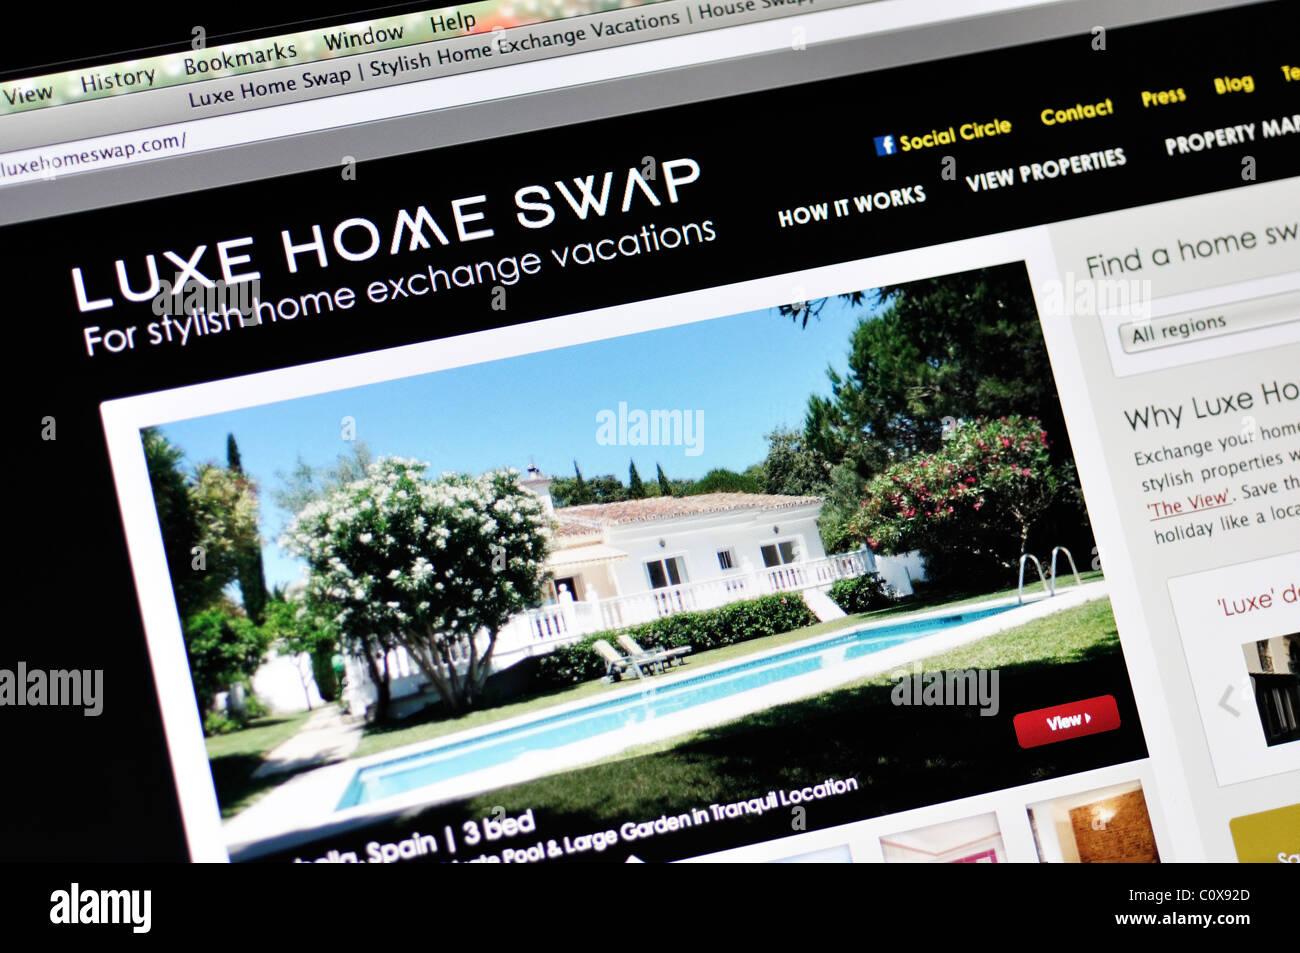 Luxury Home Swap Website   Stock Image